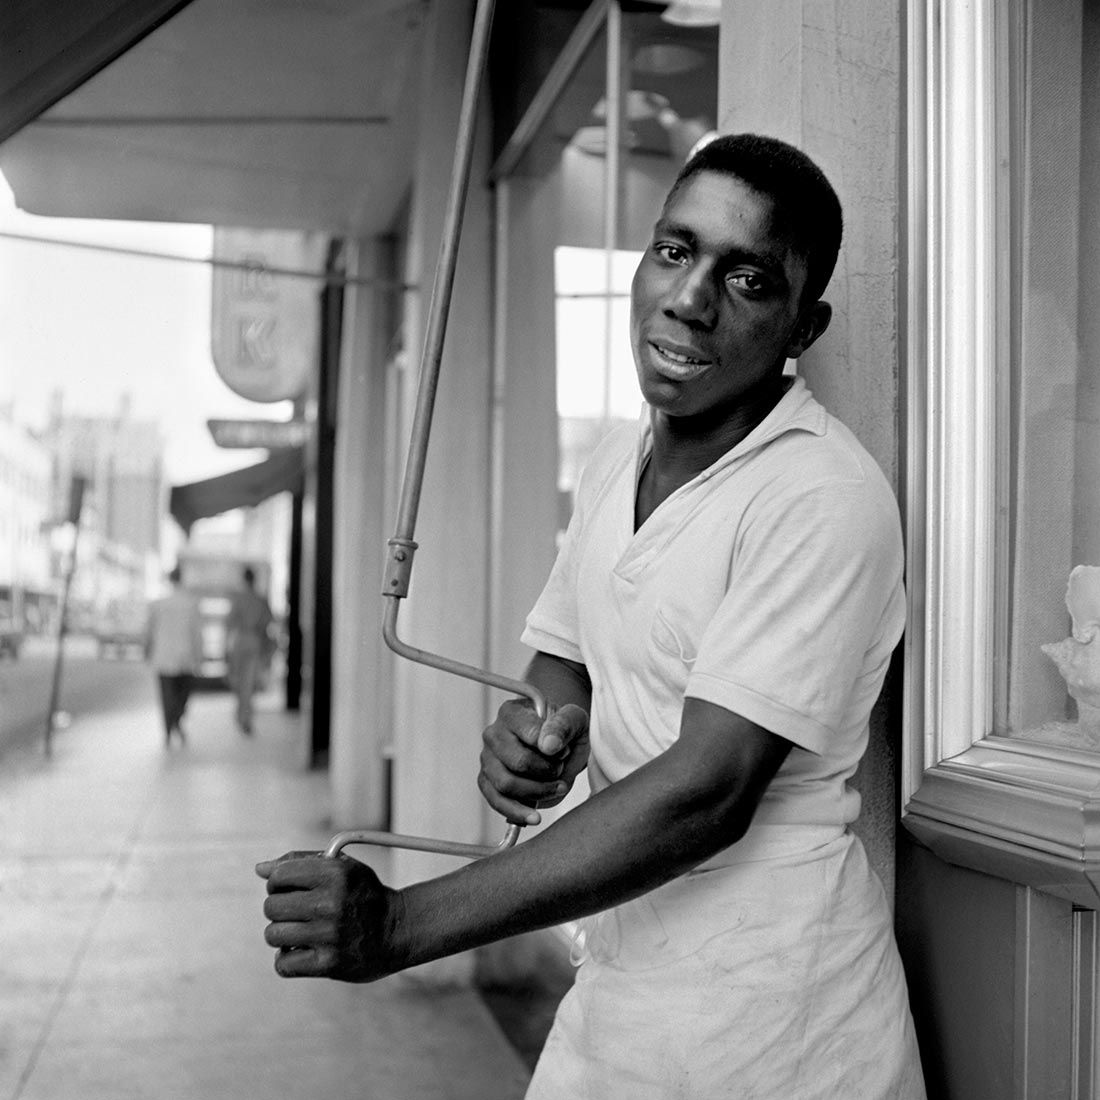 vivian maier street photographer epub